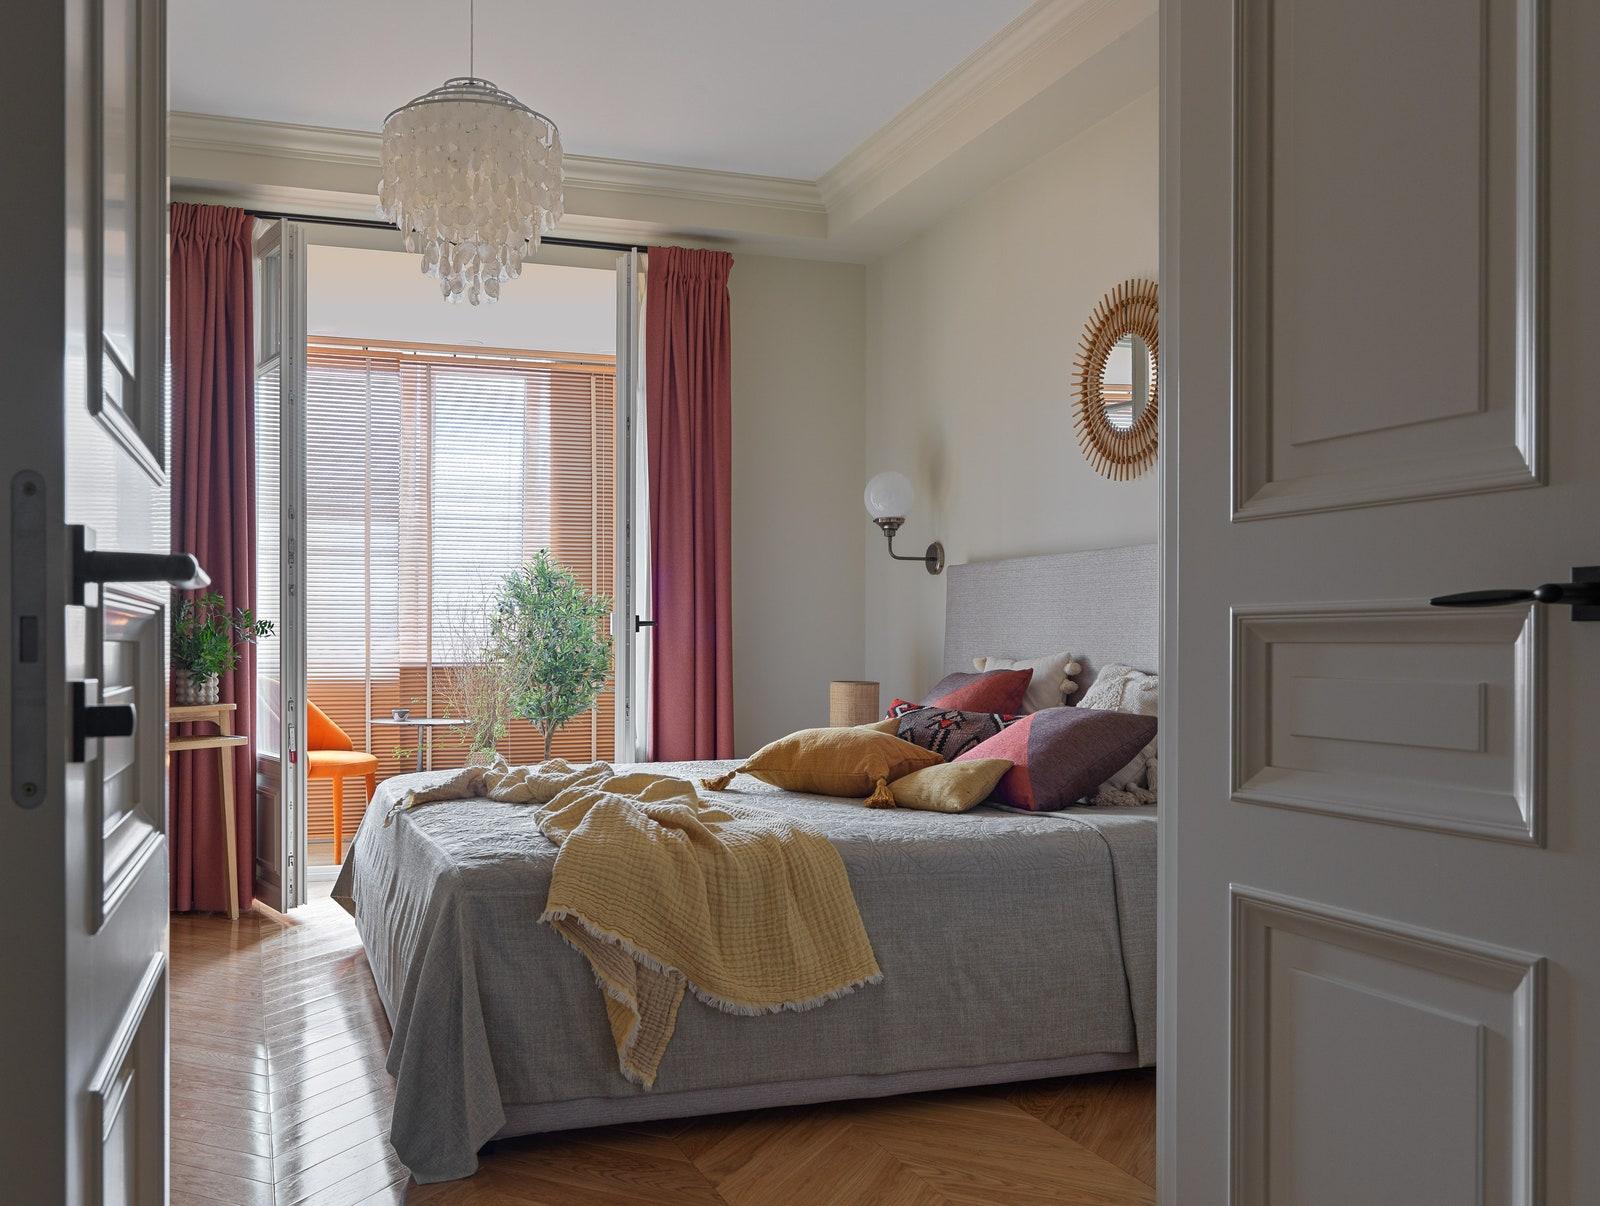 .  Dantone Home     La Redoute   Maisons du Monde      Loft Designe  Mullan   Verpan  Zara Home Nomad hic     .